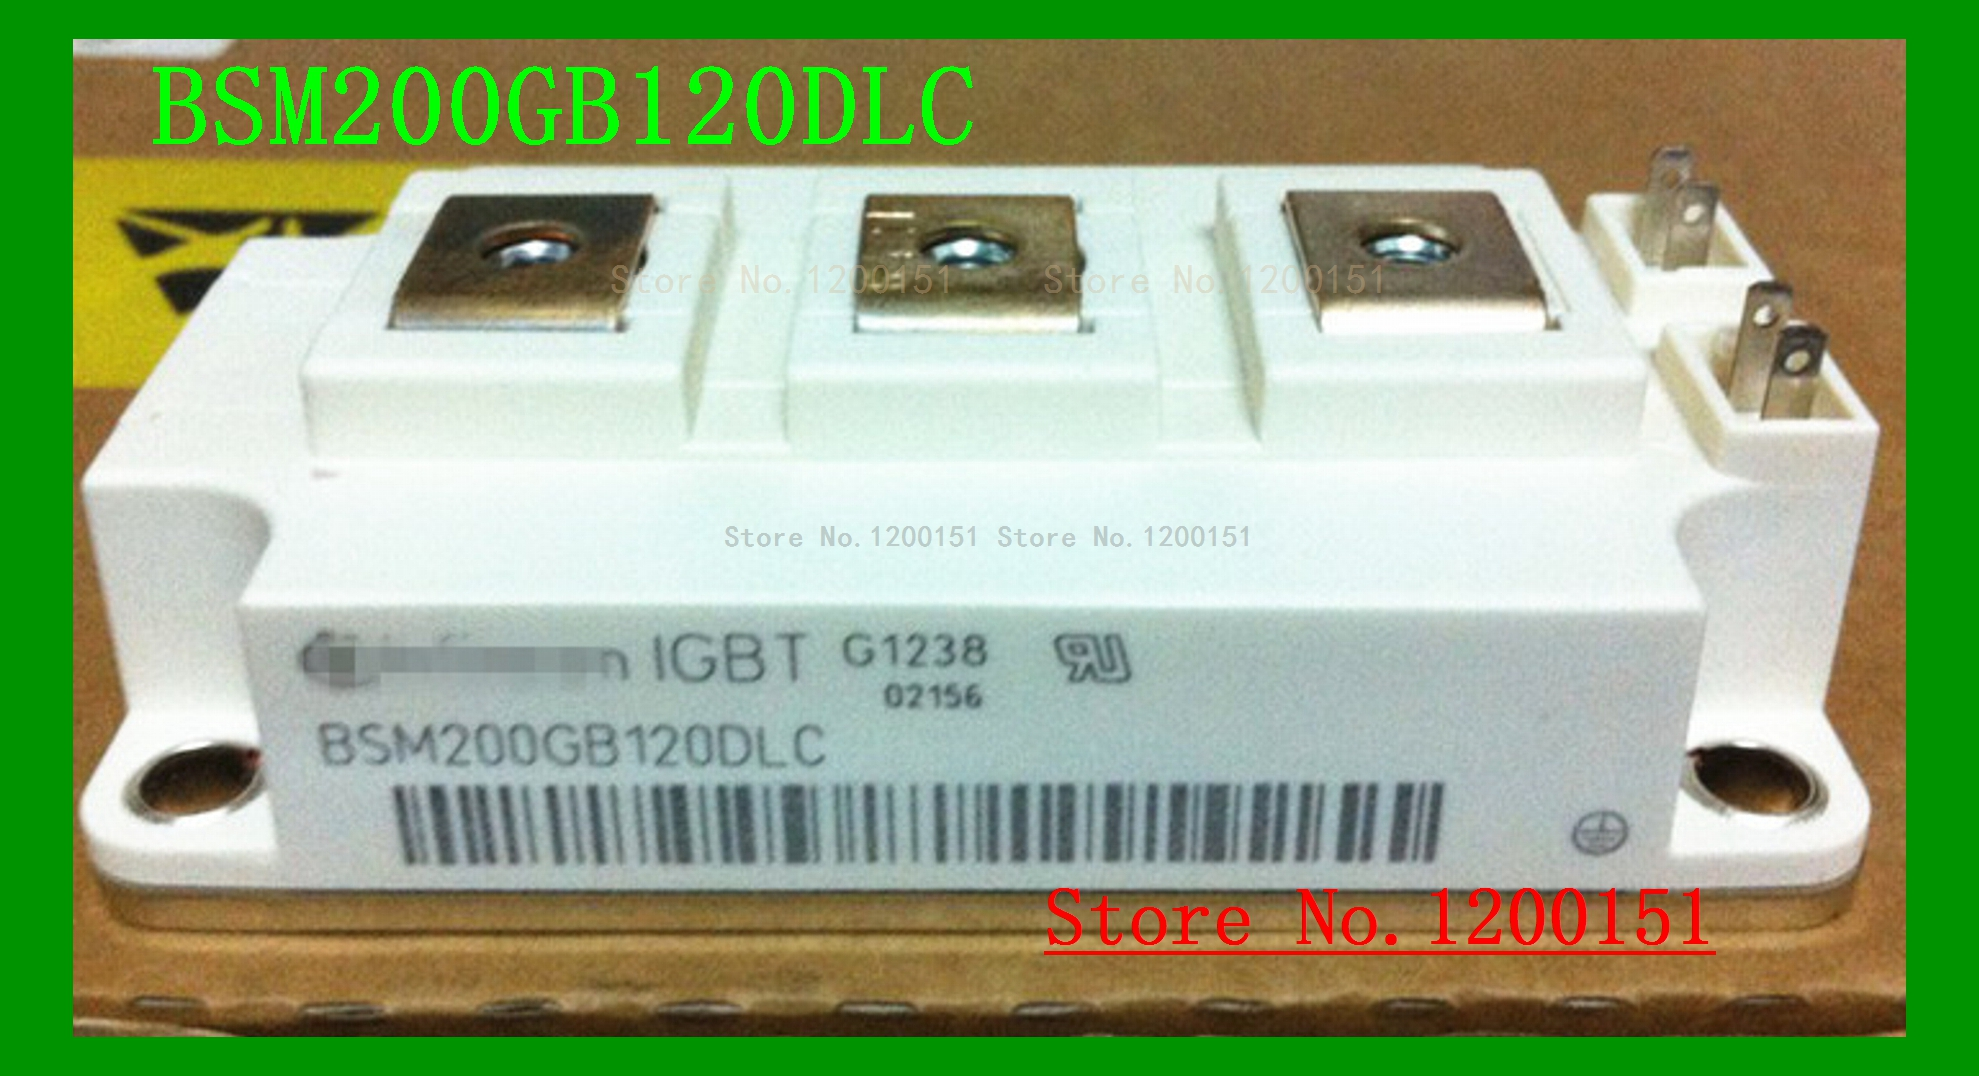 BSM200GB120DLC BSM200GB120DN2 BSM300GB120DN2 FF150R12KT3 FF200R12KE3 FF200R12KE4 FF200R12KS4 FF200R12KT4 FF200R17KE4 FF300R12KE4BSM200GB120DLC BSM200GB120DN2 BSM300GB120DN2 FF150R12KT3 FF200R12KE3 FF200R12KE4 FF200R12KS4 FF200R12KT4 FF200R17KE4 FF300R12KE4